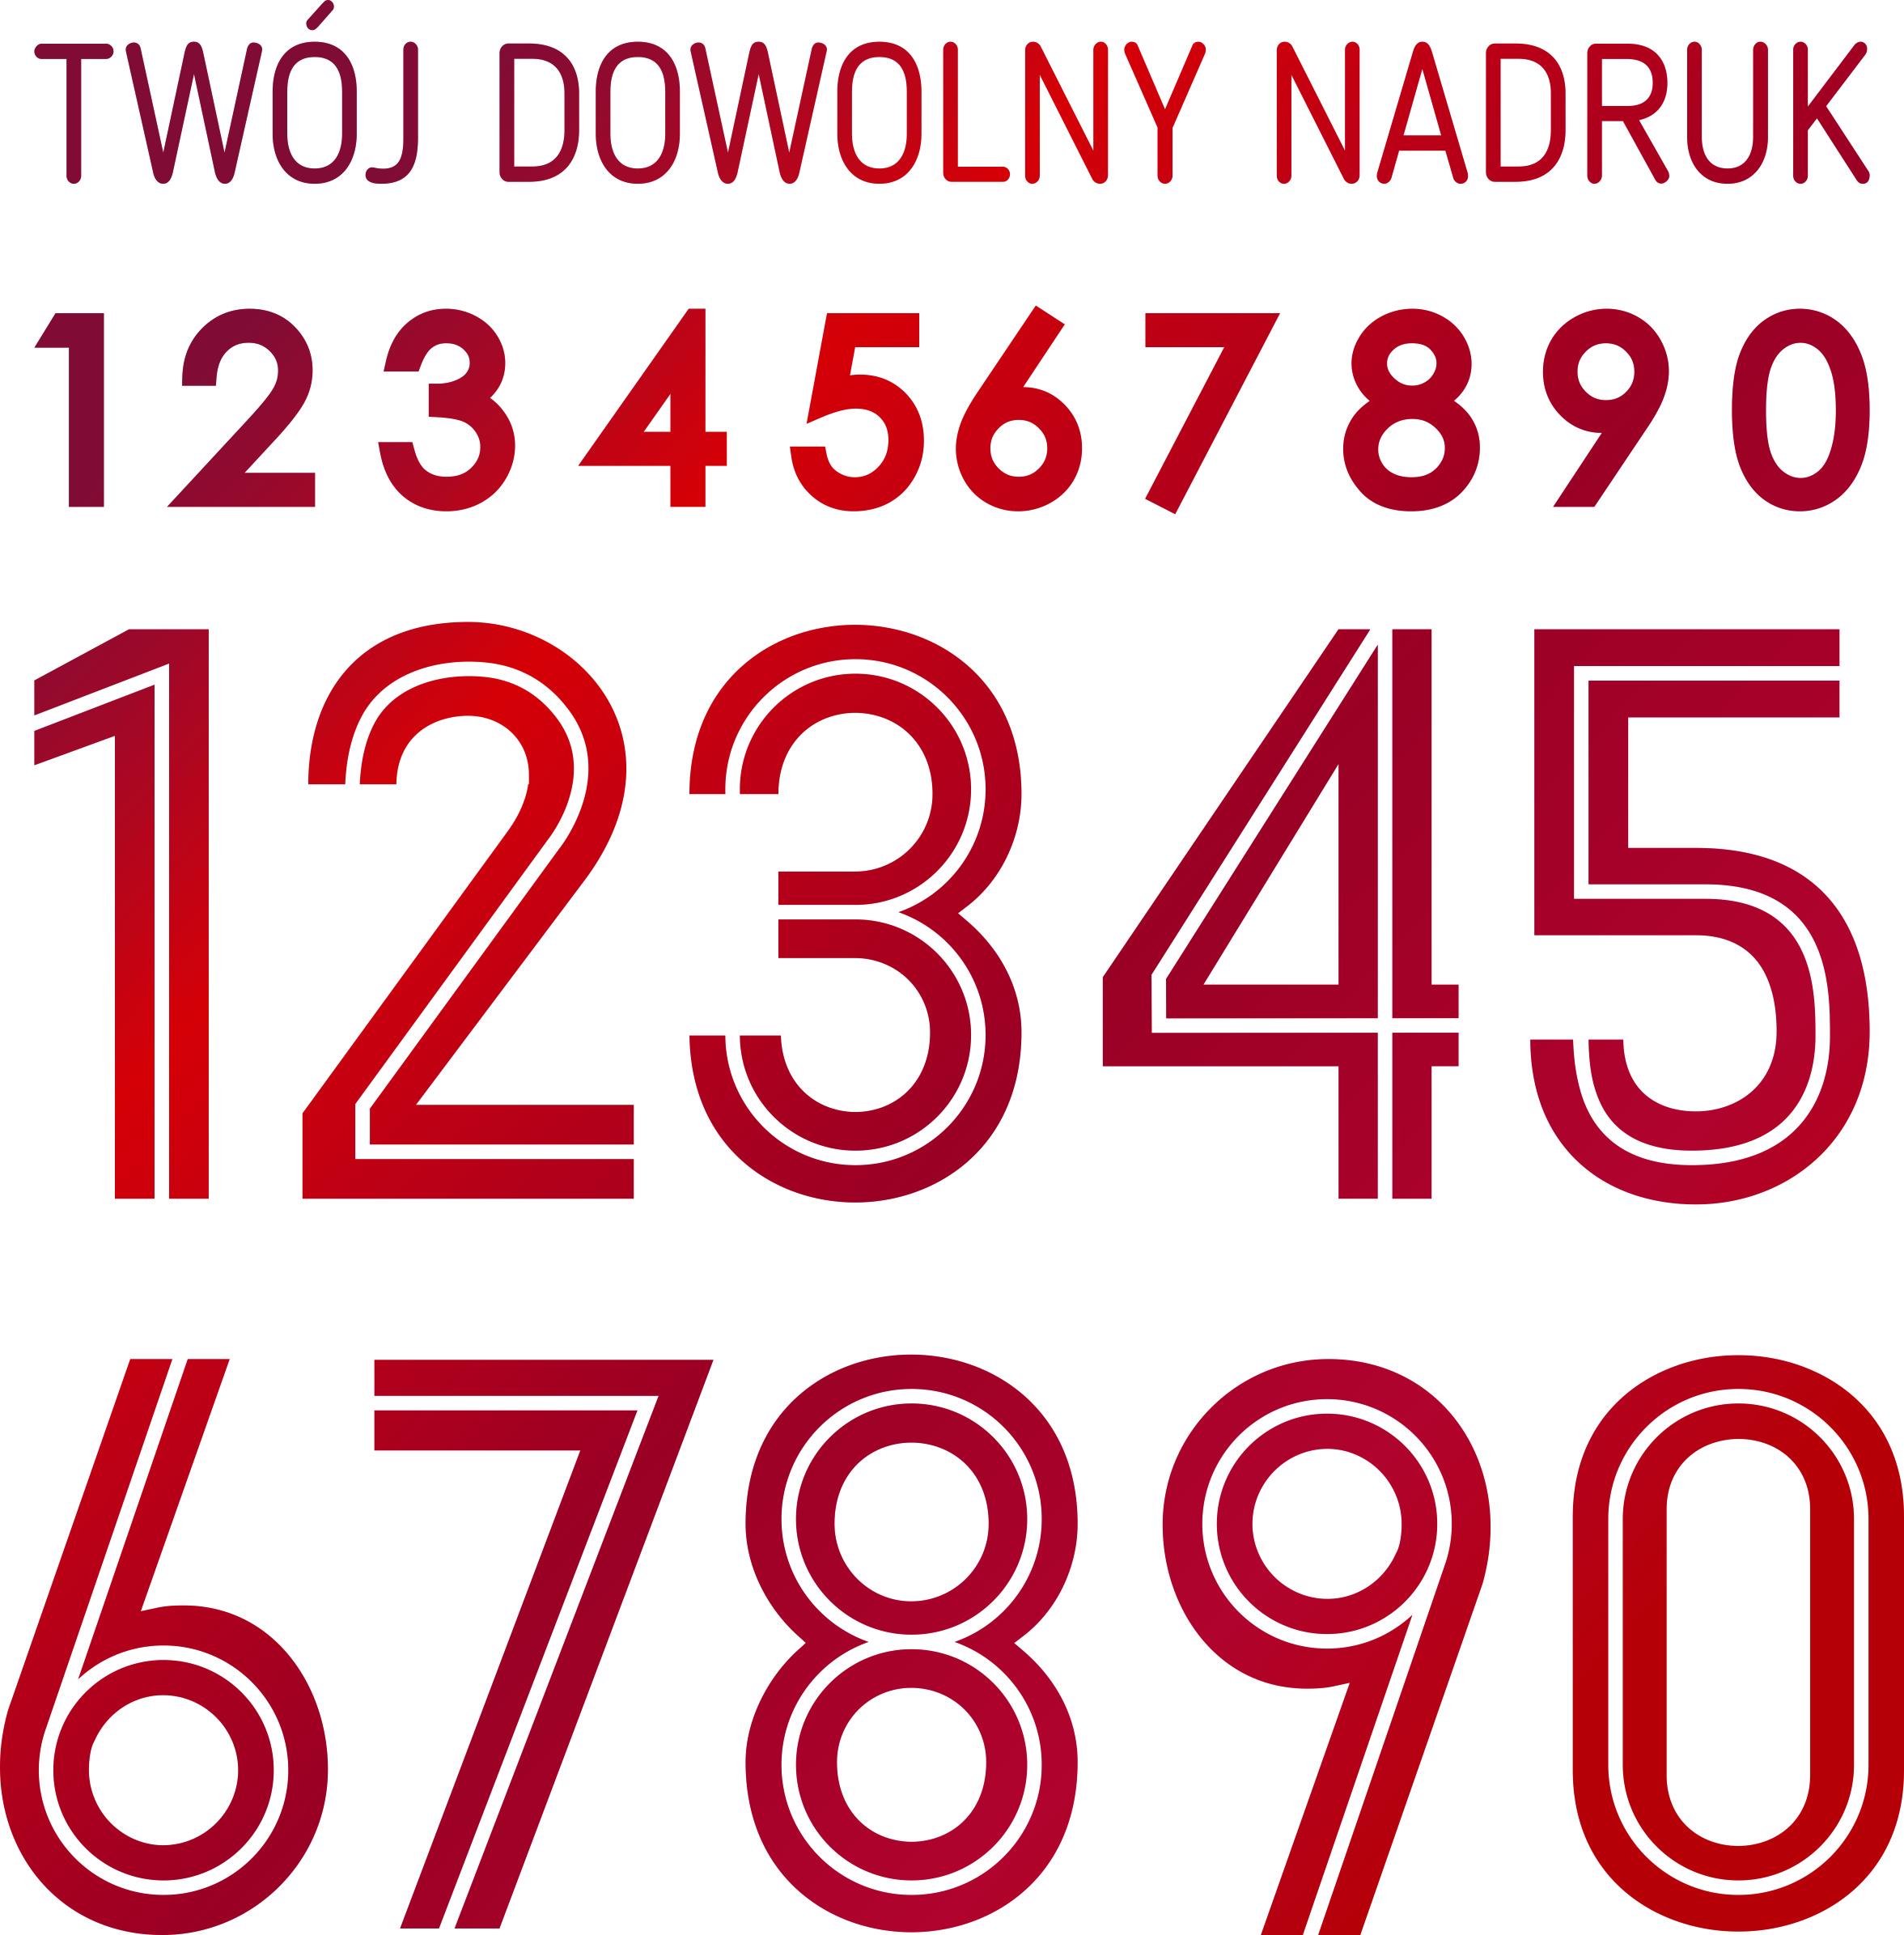 reprezentacja polski czcionka numery nazwiska